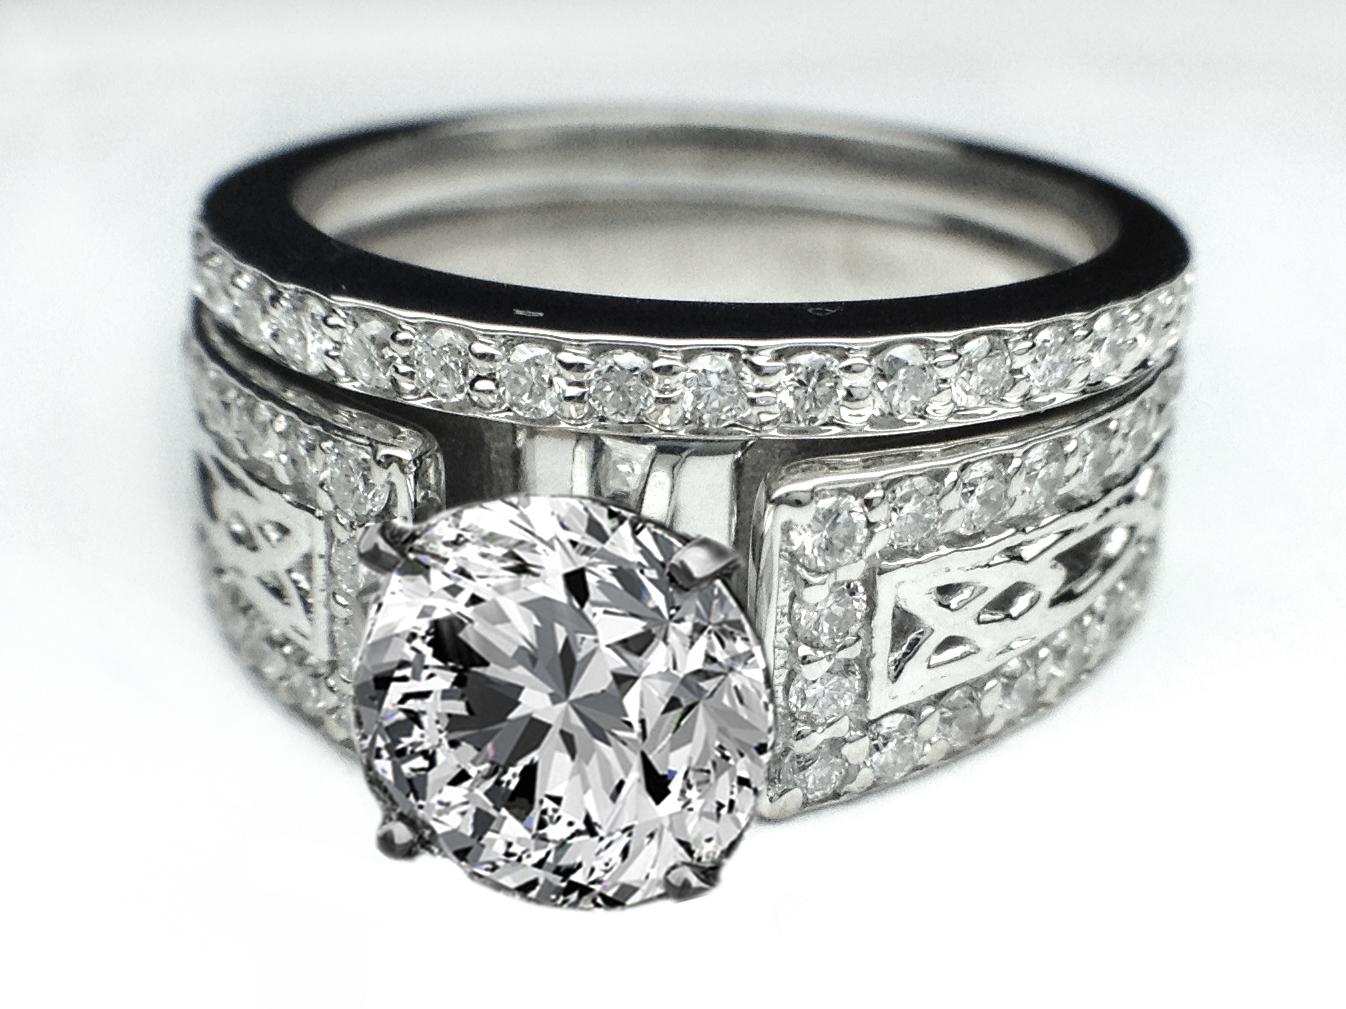 celtic wedding bands engagement rings celtic wedding ring celtic wedding bands engagement rings